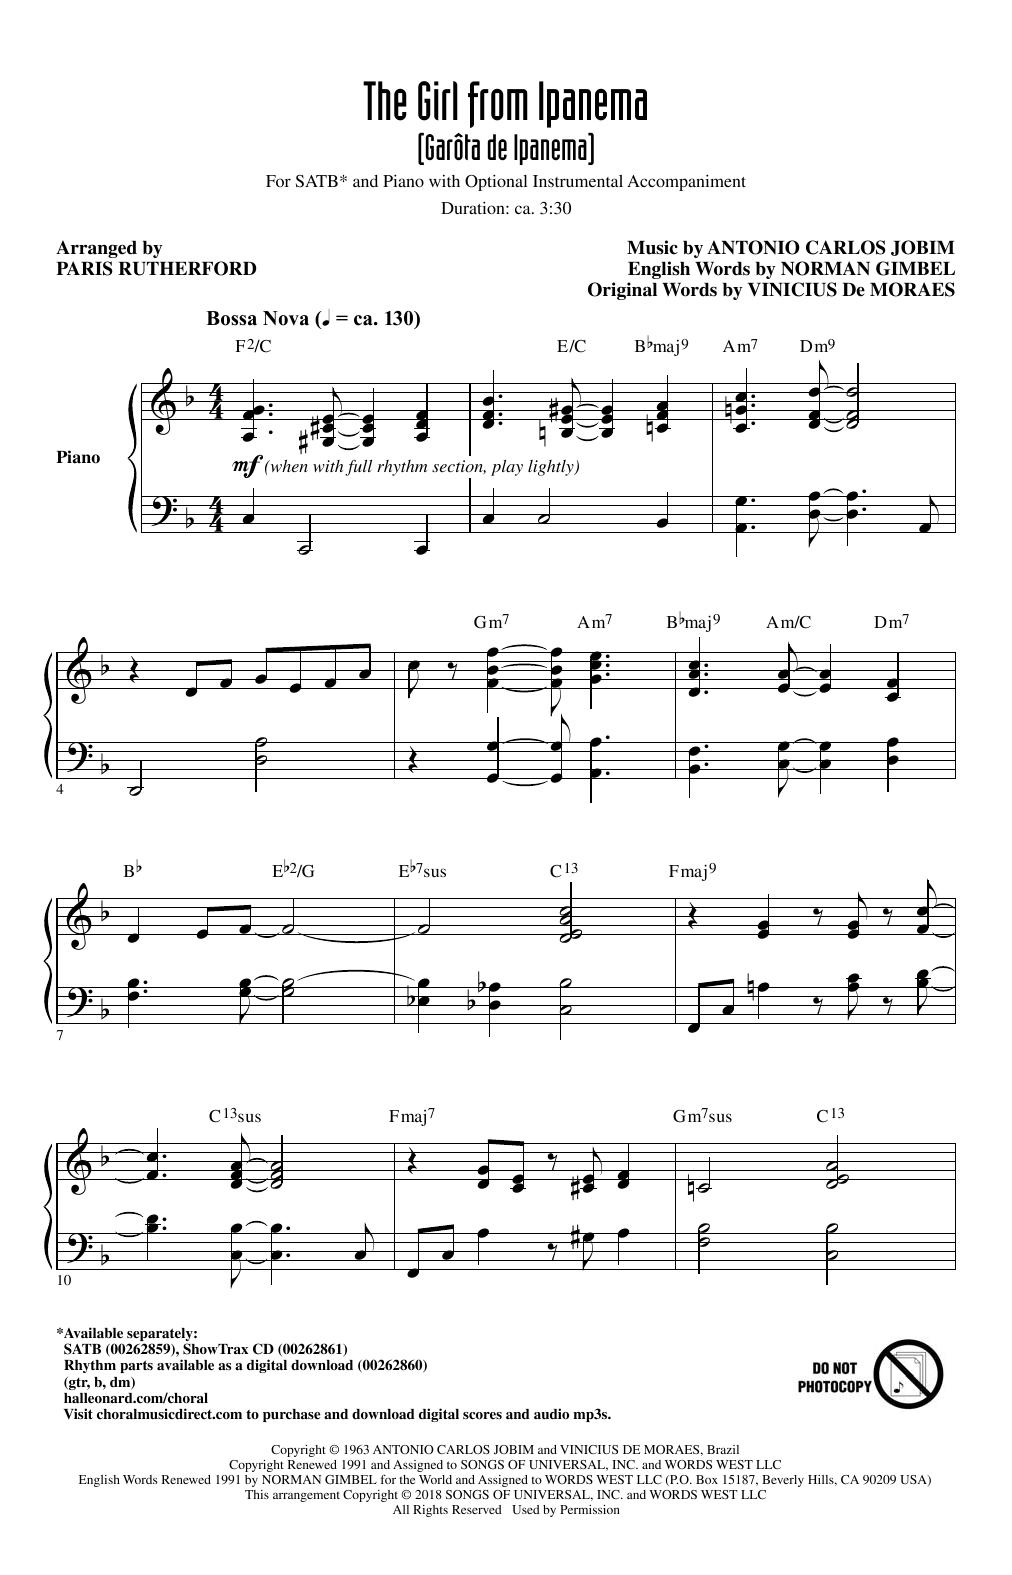 The Girl From Ipanema (Garota De Ipanema) (SATB Choir)